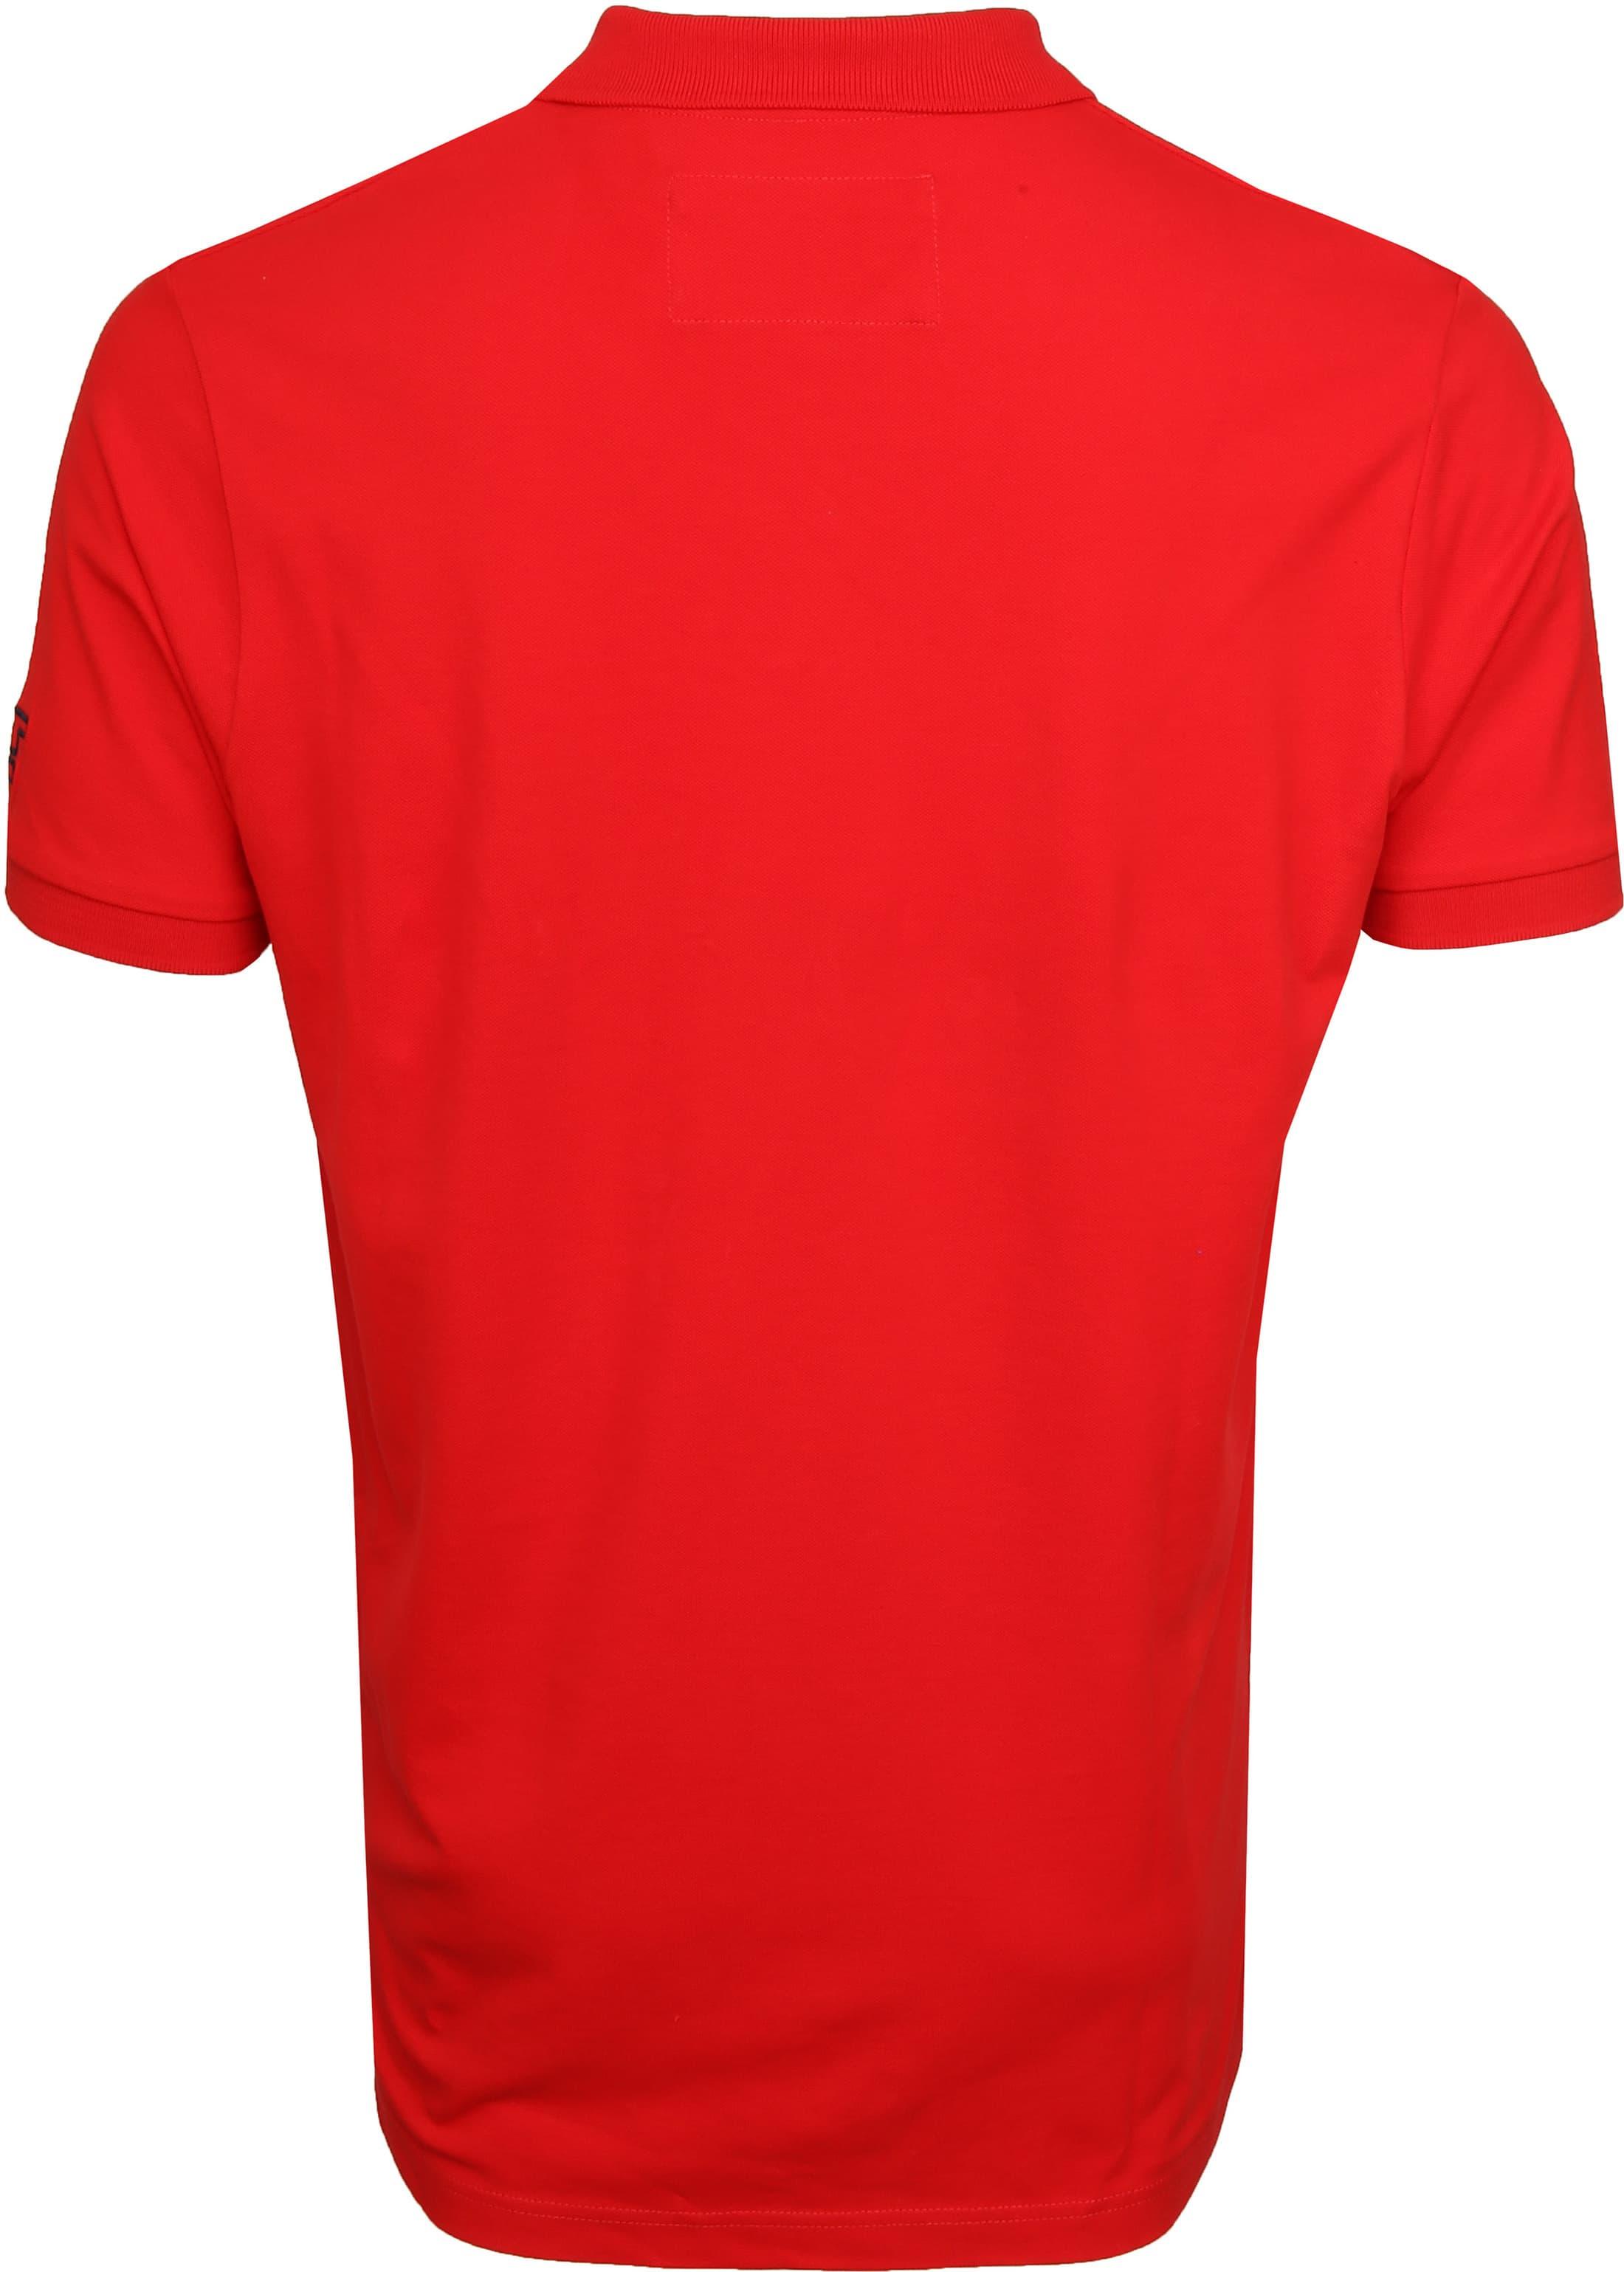 Tenson Poloshirt Zenith Red foto 4